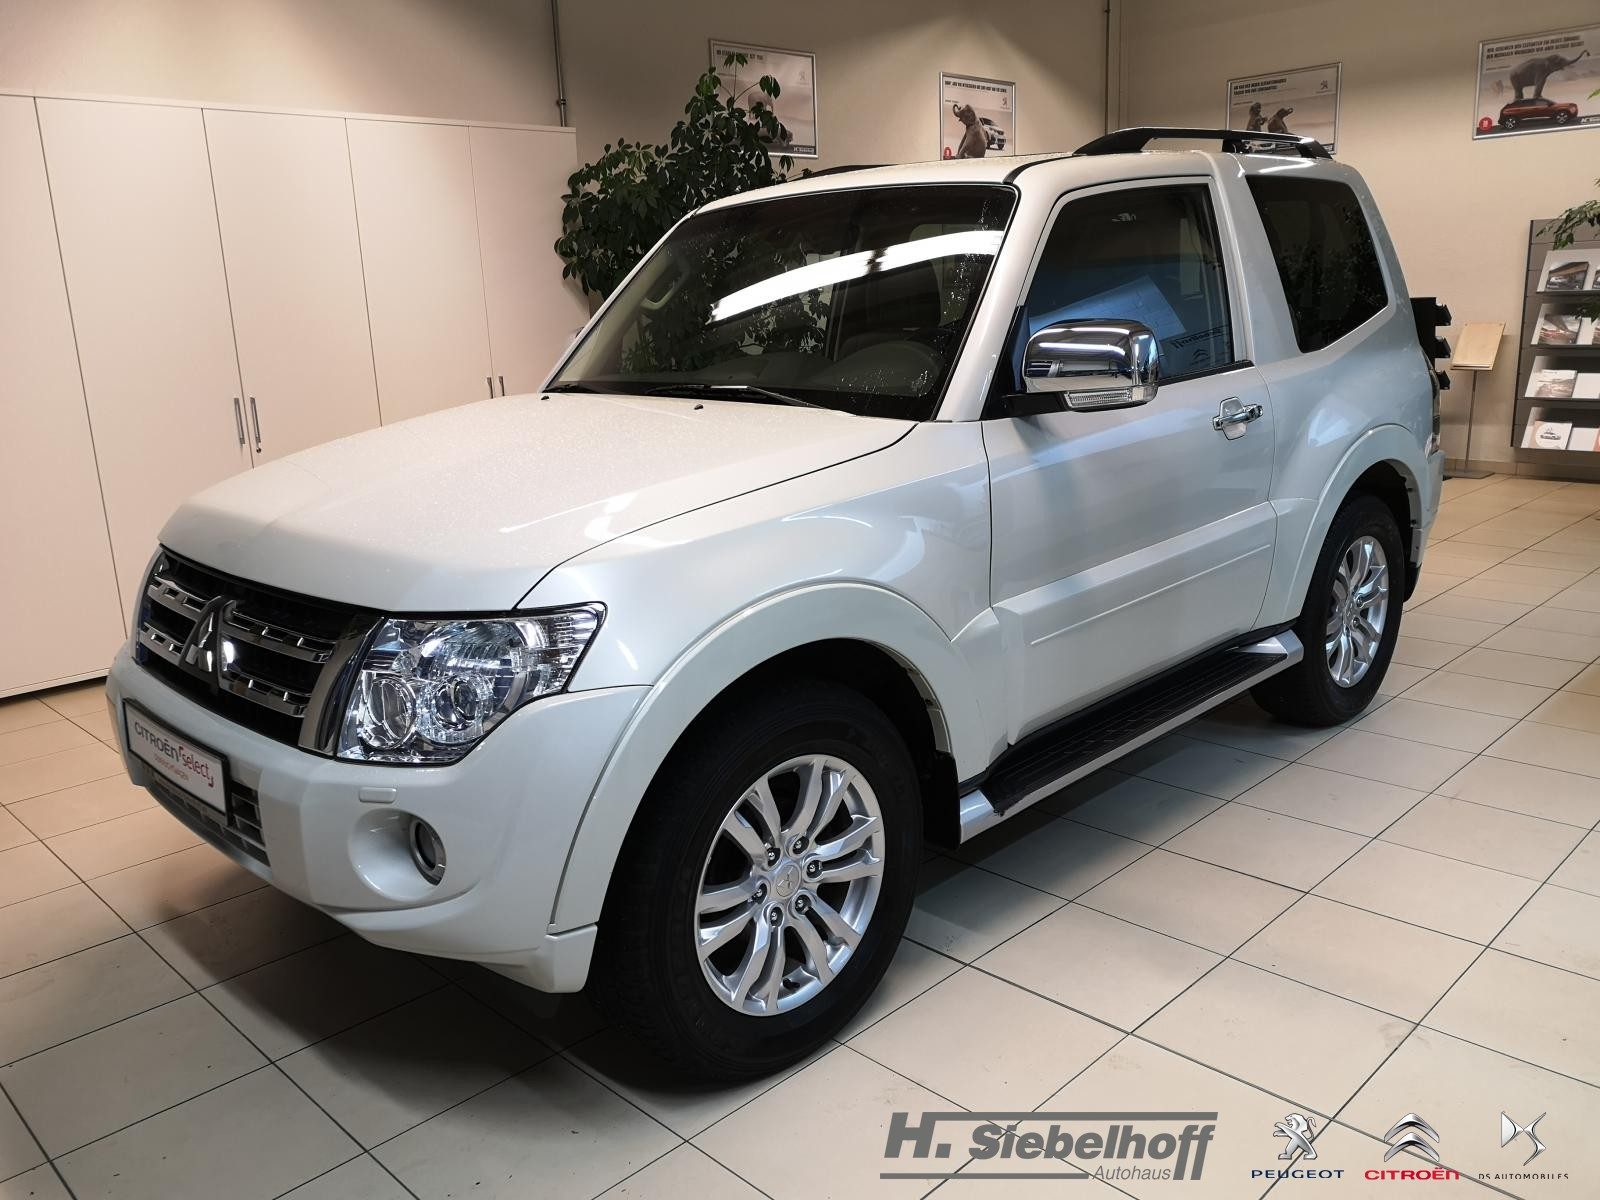 Mitsubishi Pajero 3.2 Di-D Edition 30 *Navi*AHK*Panoramadach*Leder*, Jahr 2013, Diesel